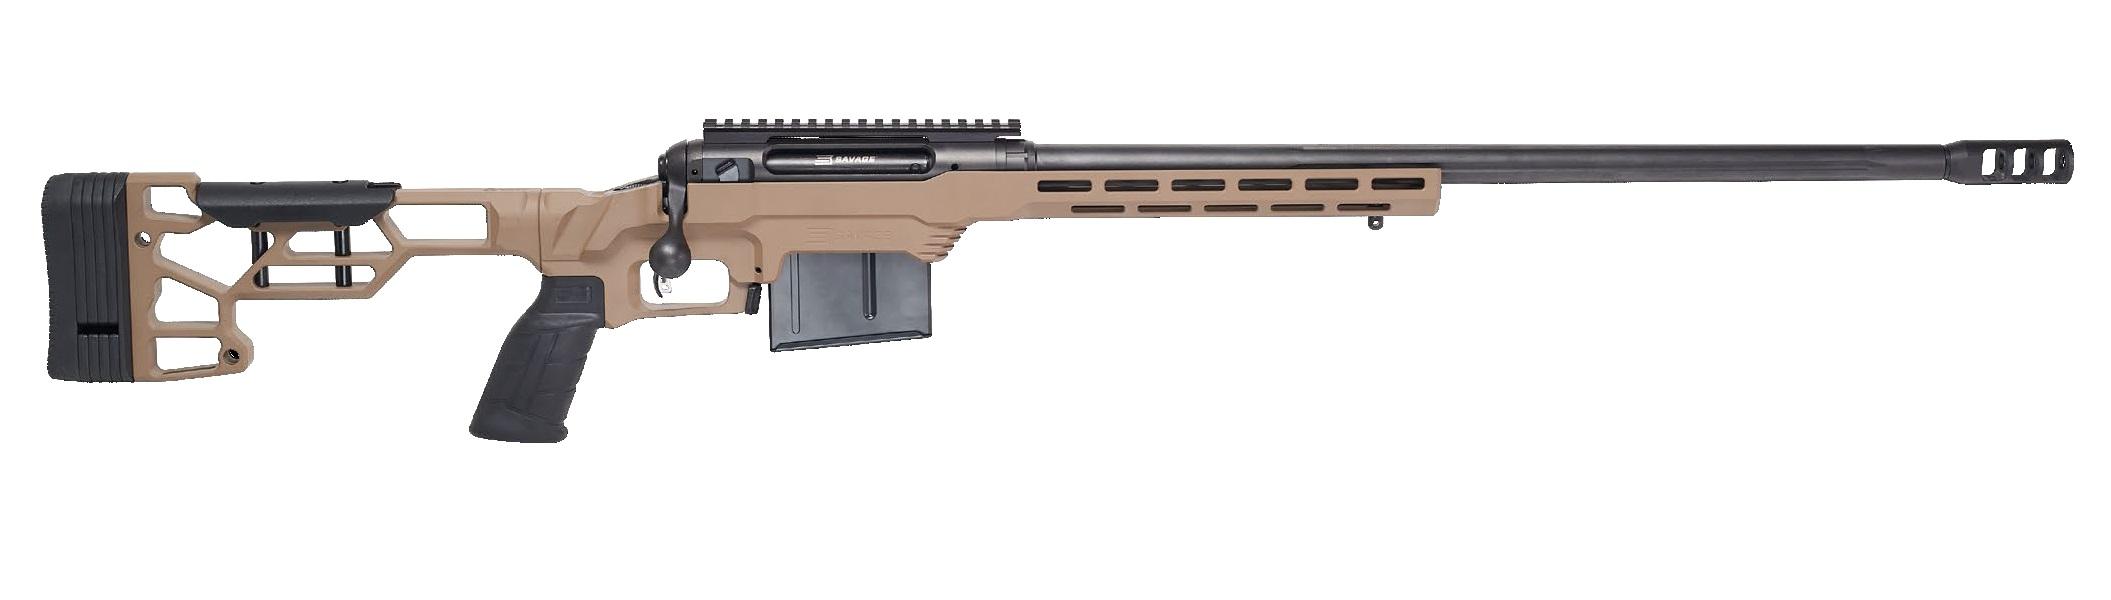 Savage Arms 110 Precision 300 Win Mag